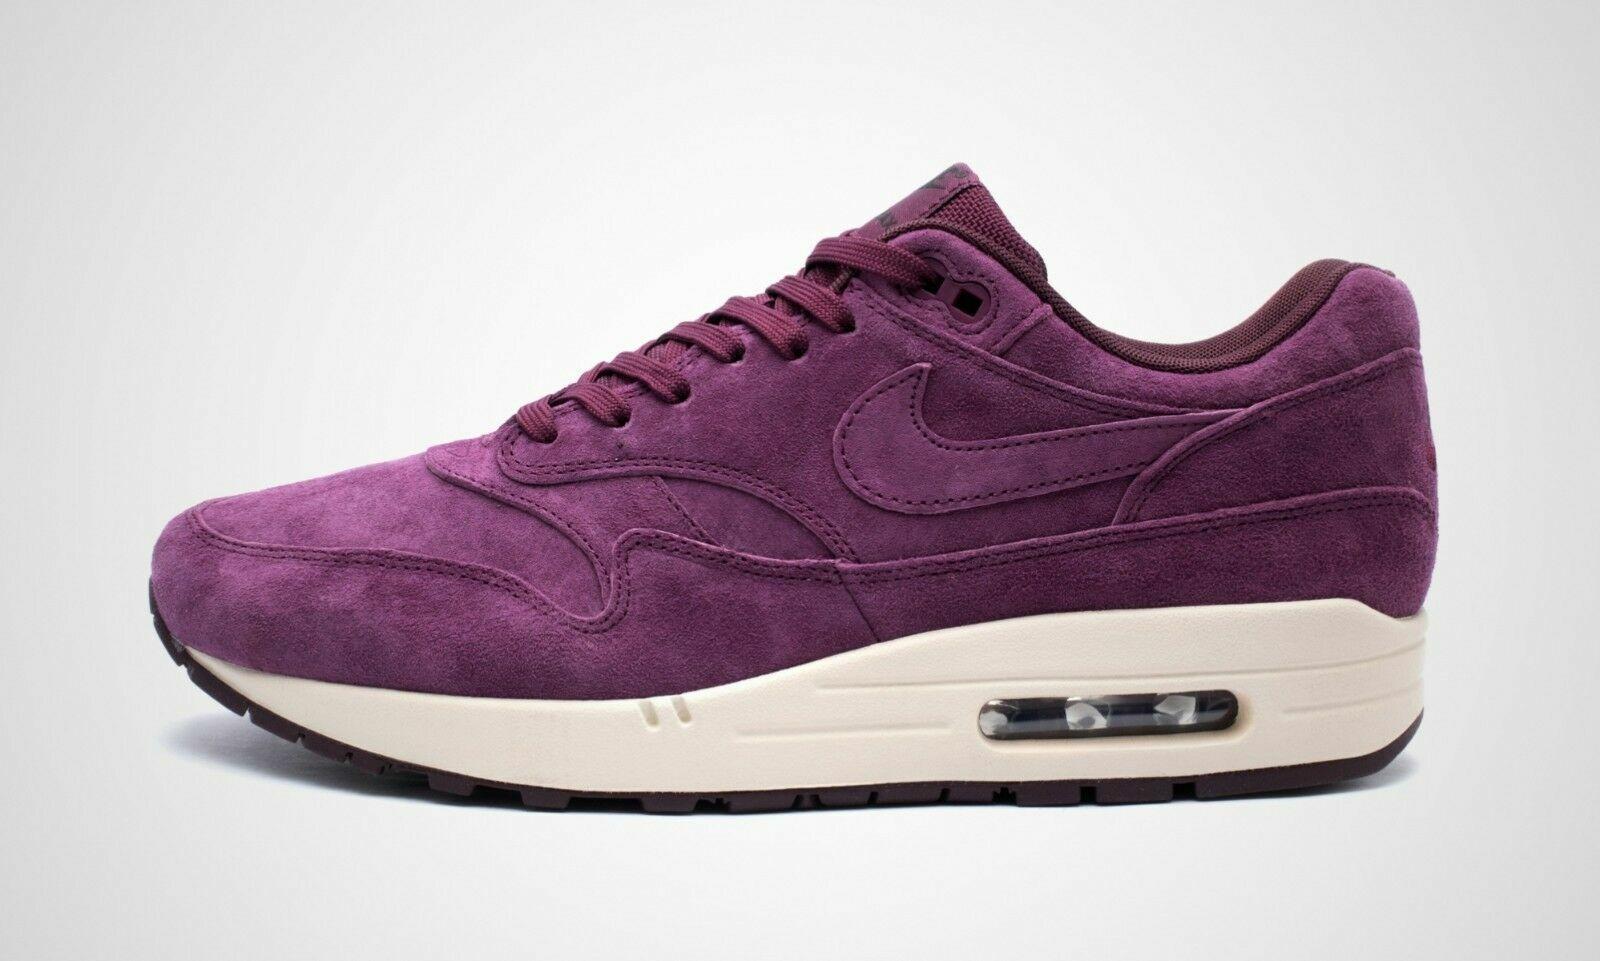 Nike Air Max 1 Premium Suede Men's Run Training Shoes BordeauxPurple 875844 602